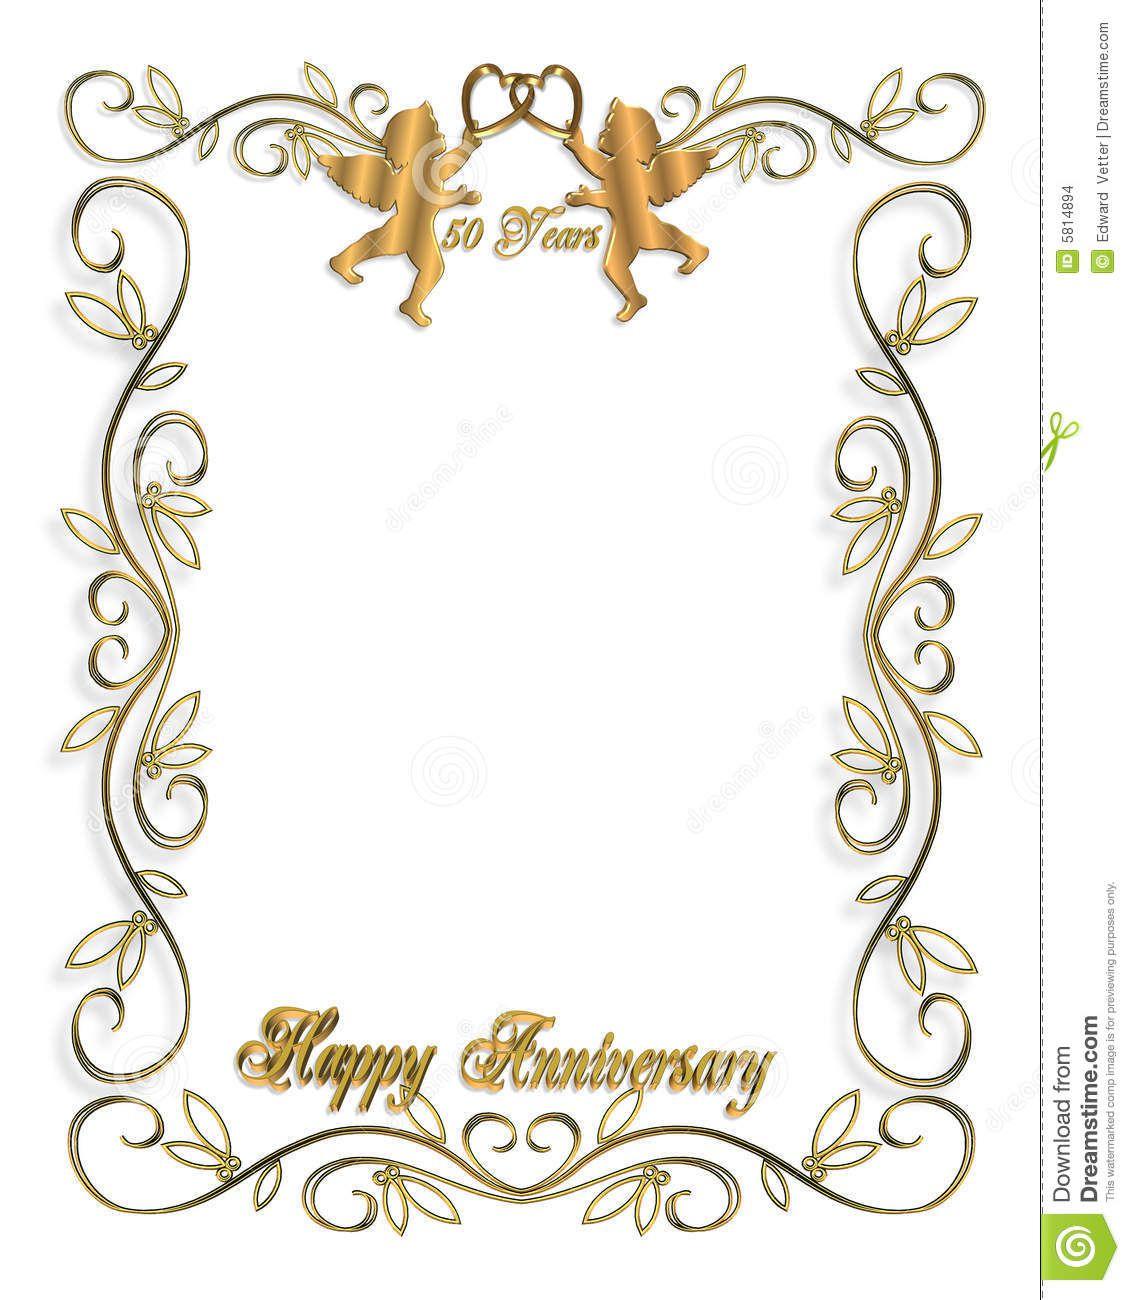 009 Excellent 50th Wedding Anniversary Invitation Template Free Design  Download Golden Microsoft WordFull